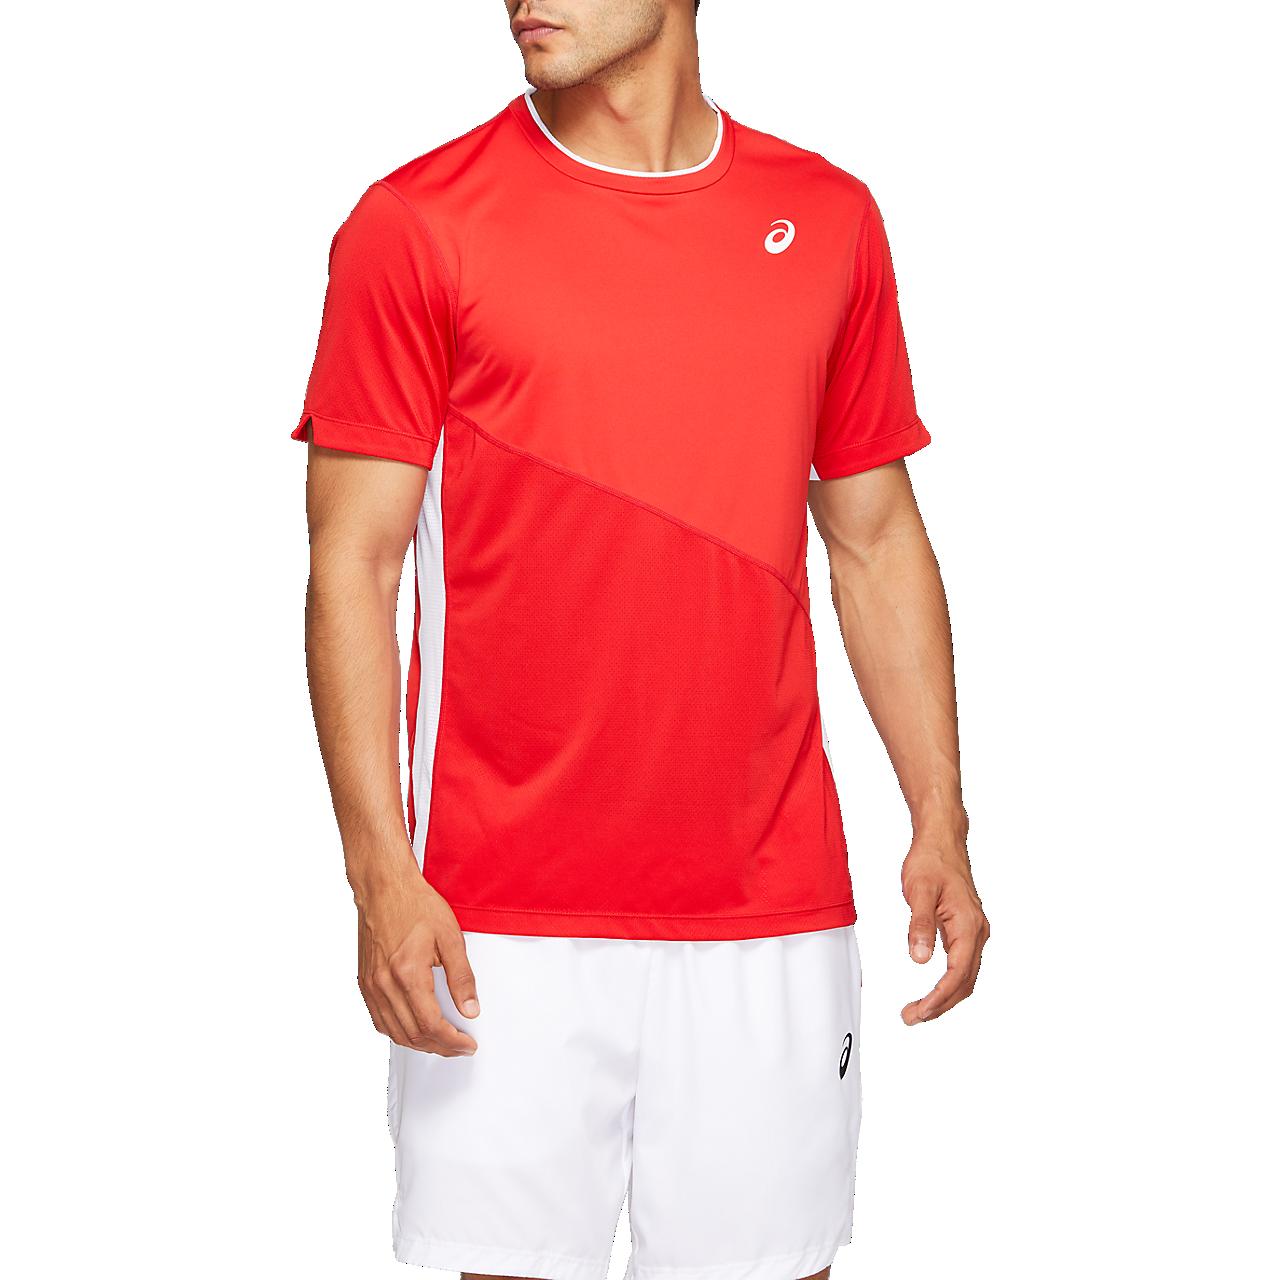 Camiseta Asics Club rojo